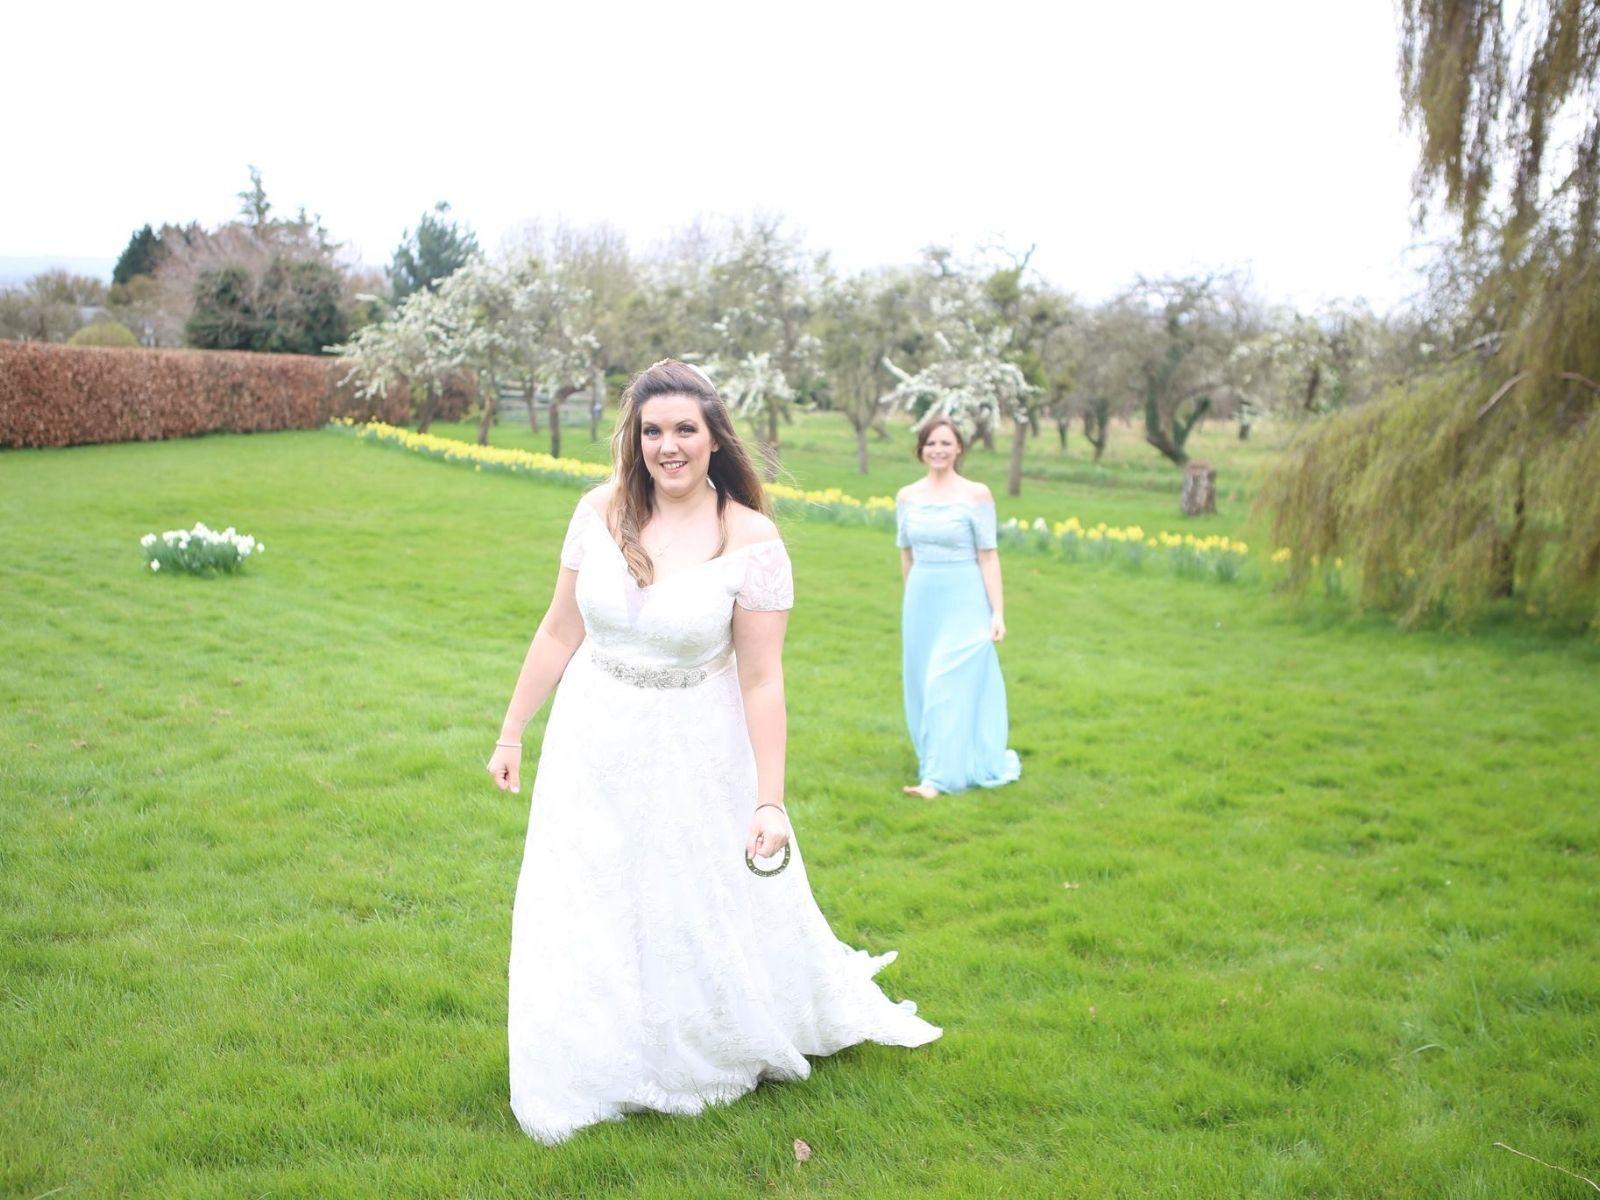 Loaned wedding dress Stratford Upon Avon